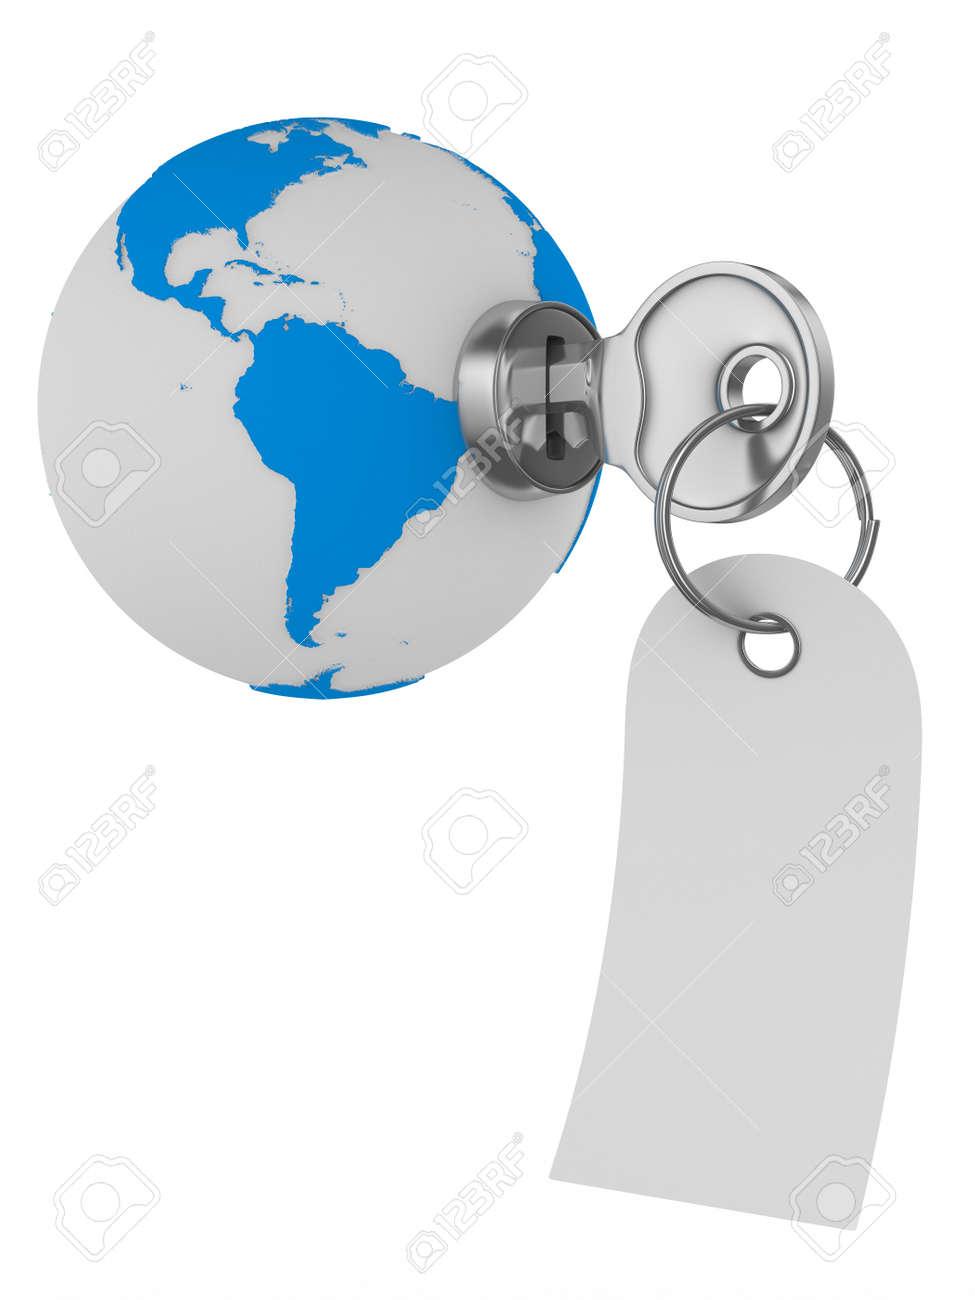 world and key on white background. Isolated 3D image Stock Photo - 11972100